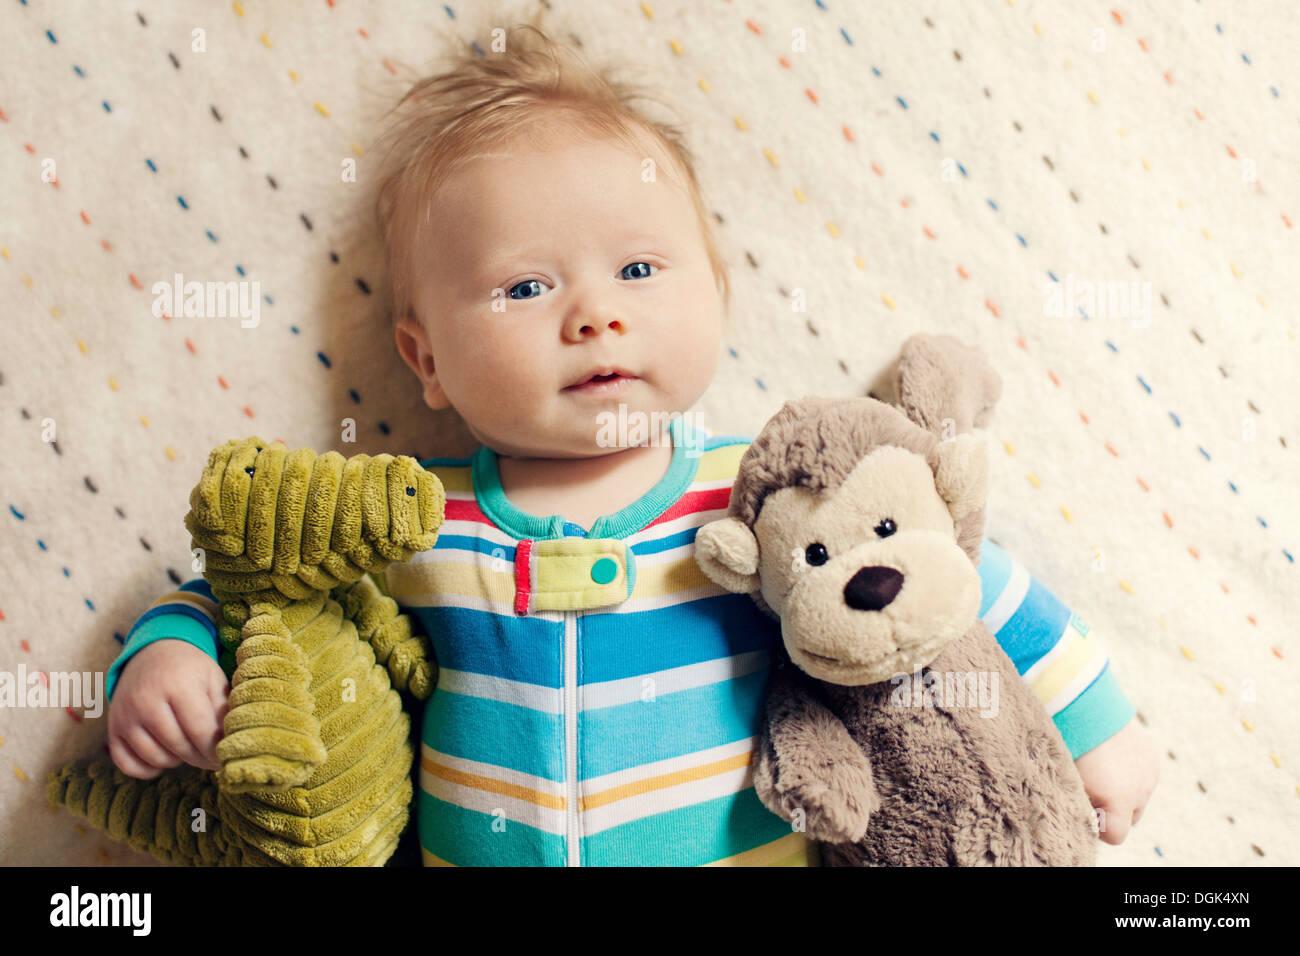 Baby boy cuddling soft toys - Stock Image